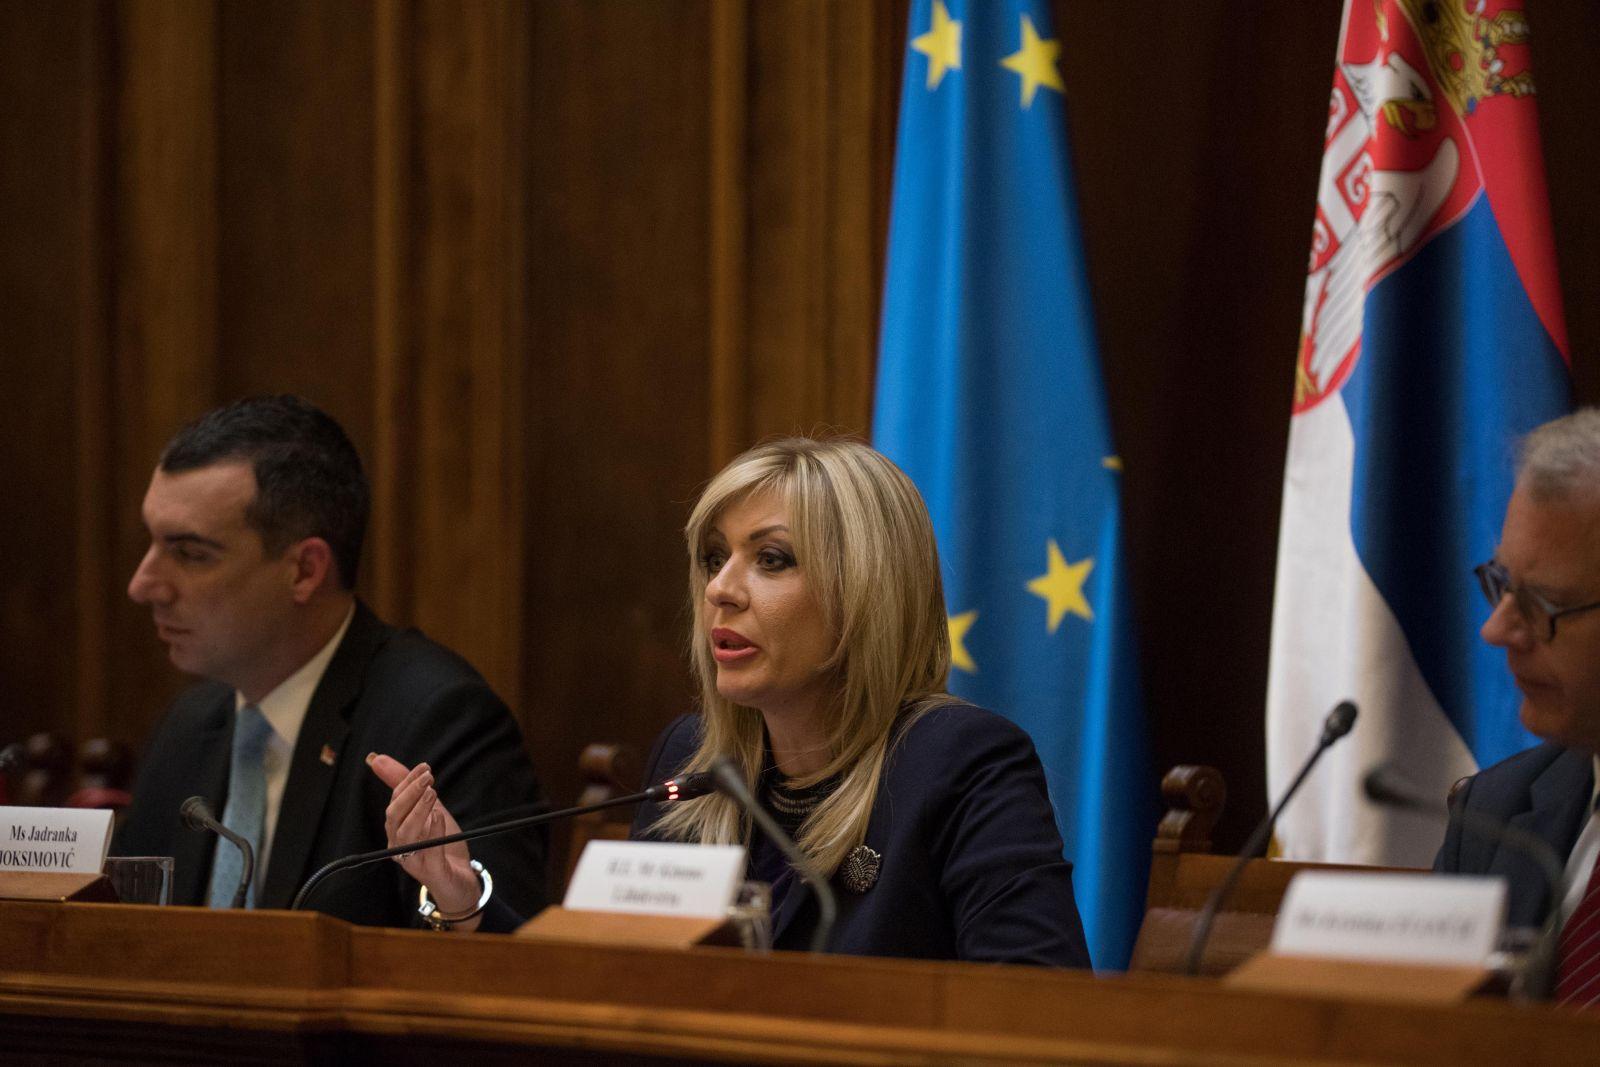 J. Joksimović: Serbia, as an EU candidate, demonstrates great responsibility